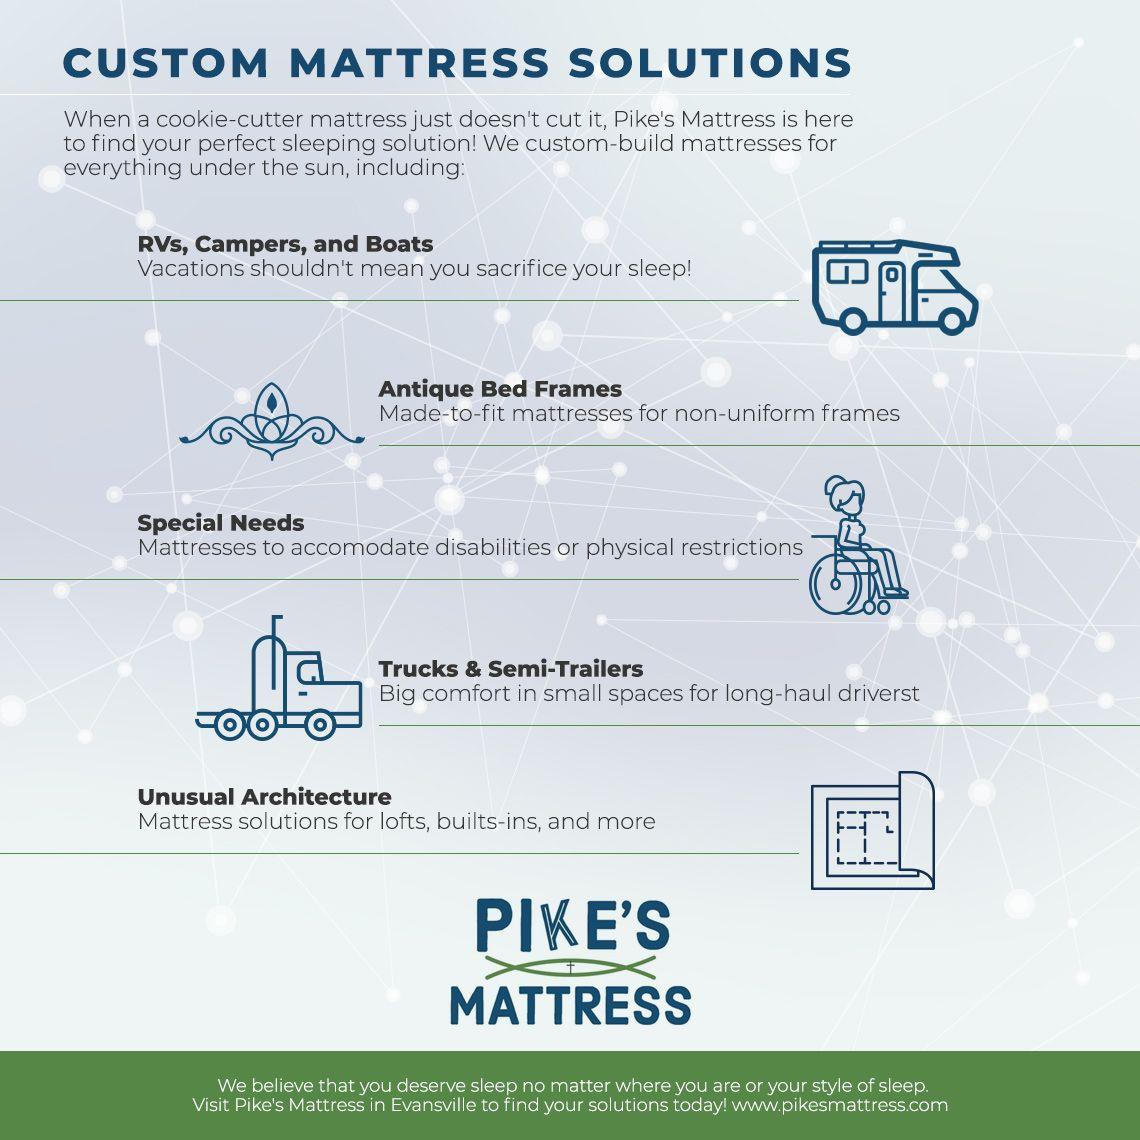 Infographic-Custom-Mattress-Solutions.jpg